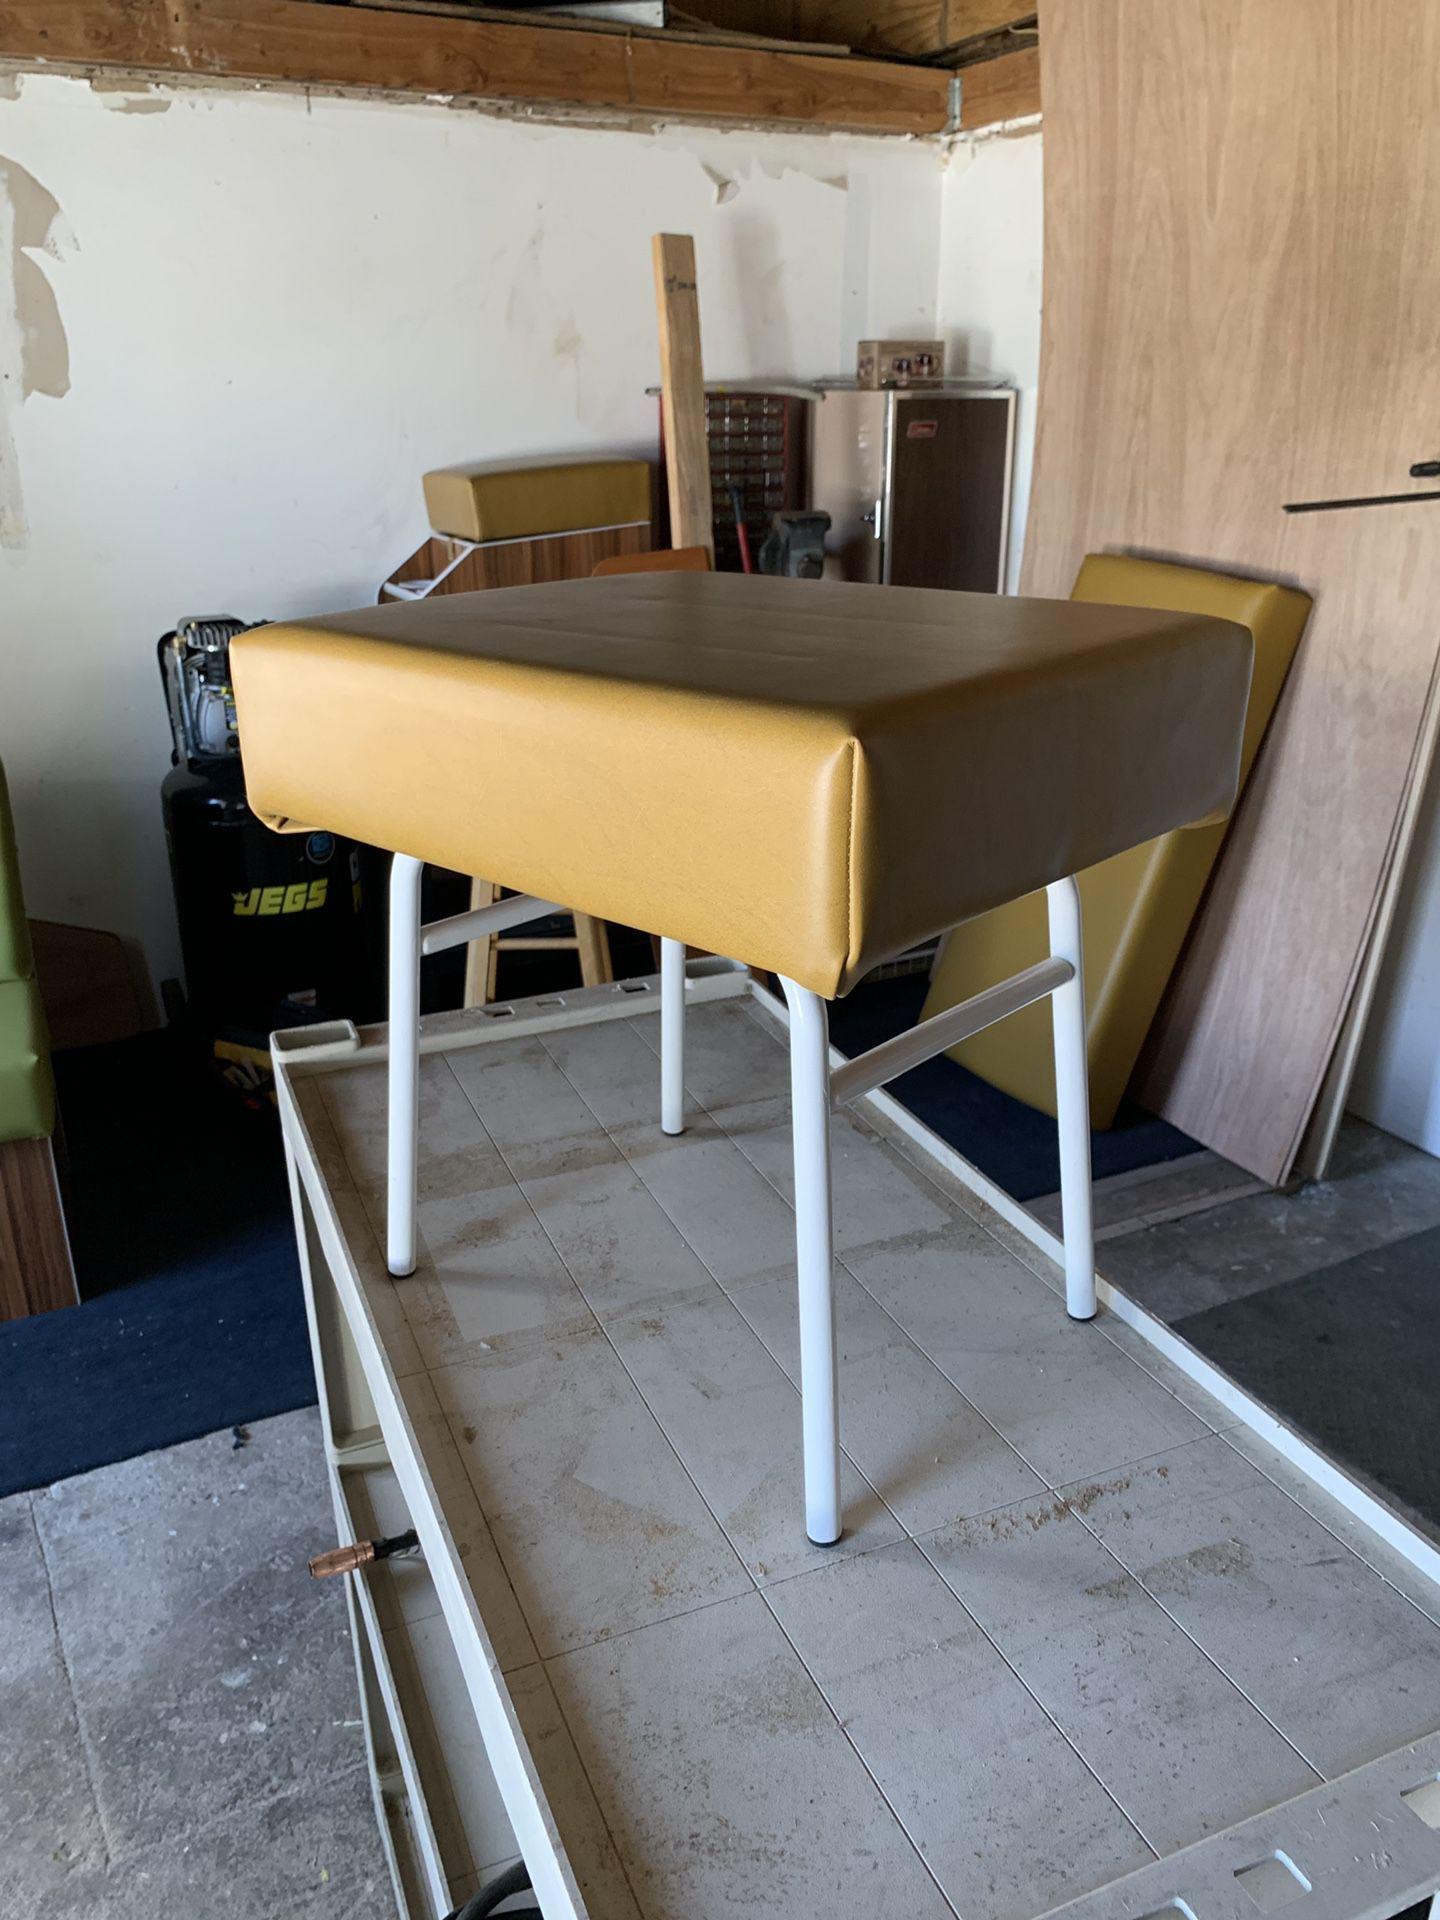 Vw bus westfalia stool